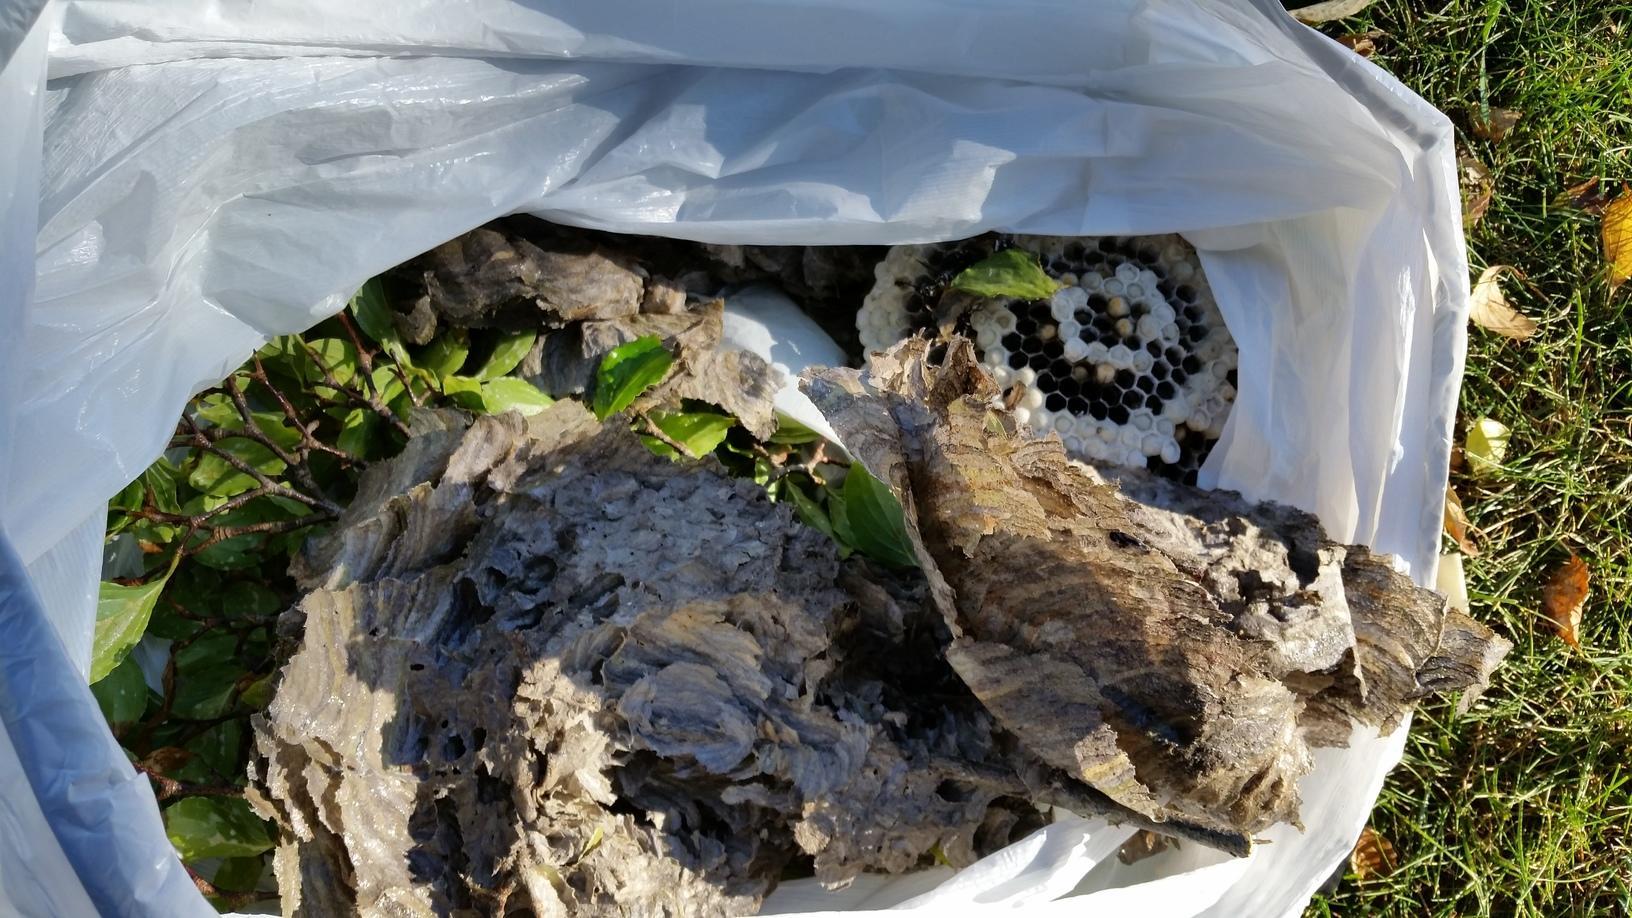 Removal of hornets nest in Iselin, NJ